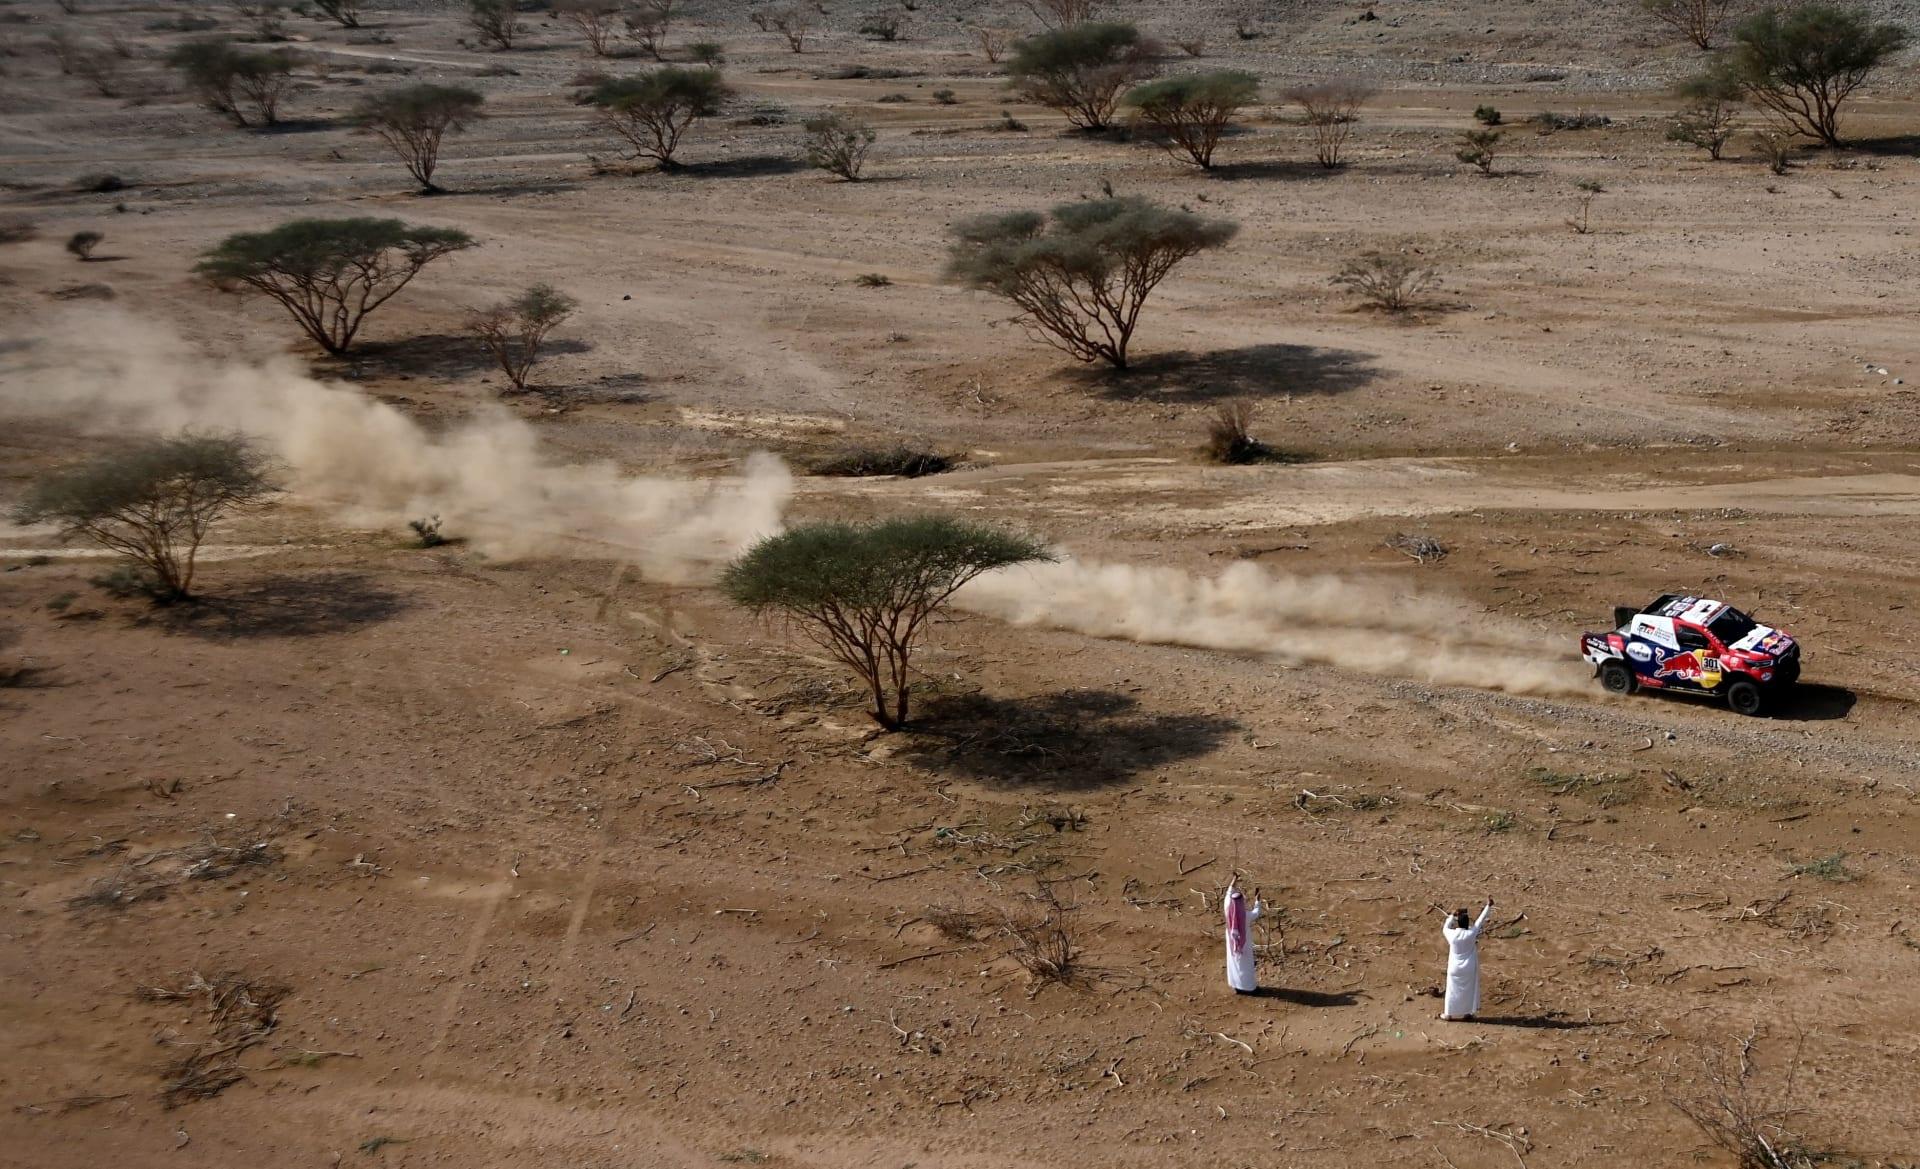 افتتاح رالي داكار قبيل انطلاقه رسميا بالسعودية.. وأول فريق نسائي سعودي يشارك فيه